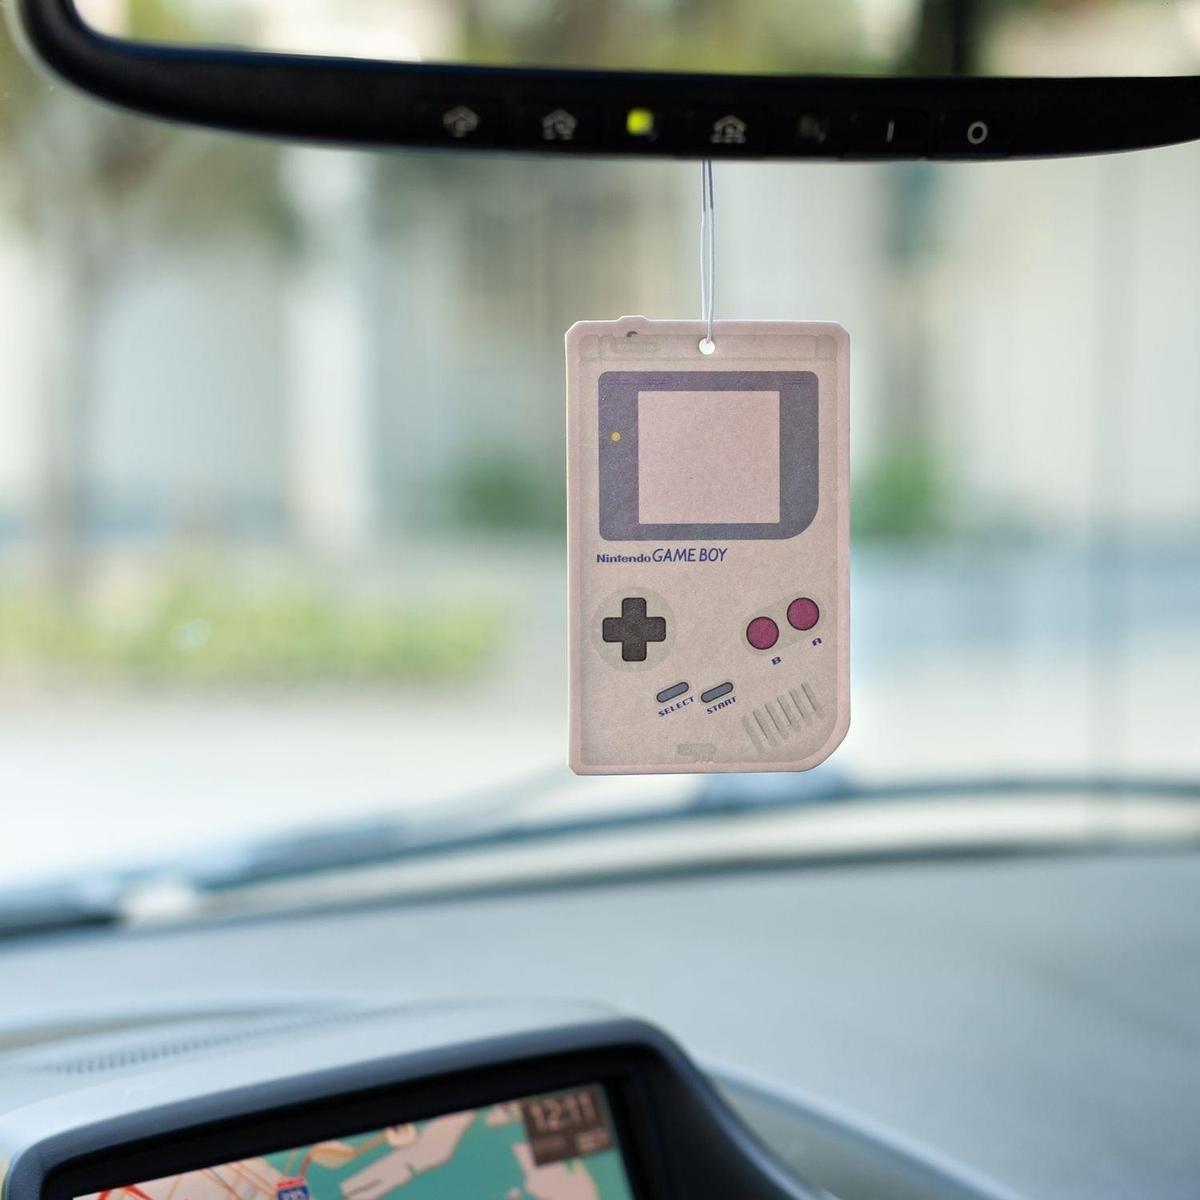 The white freshener shaped like an original Game Boy